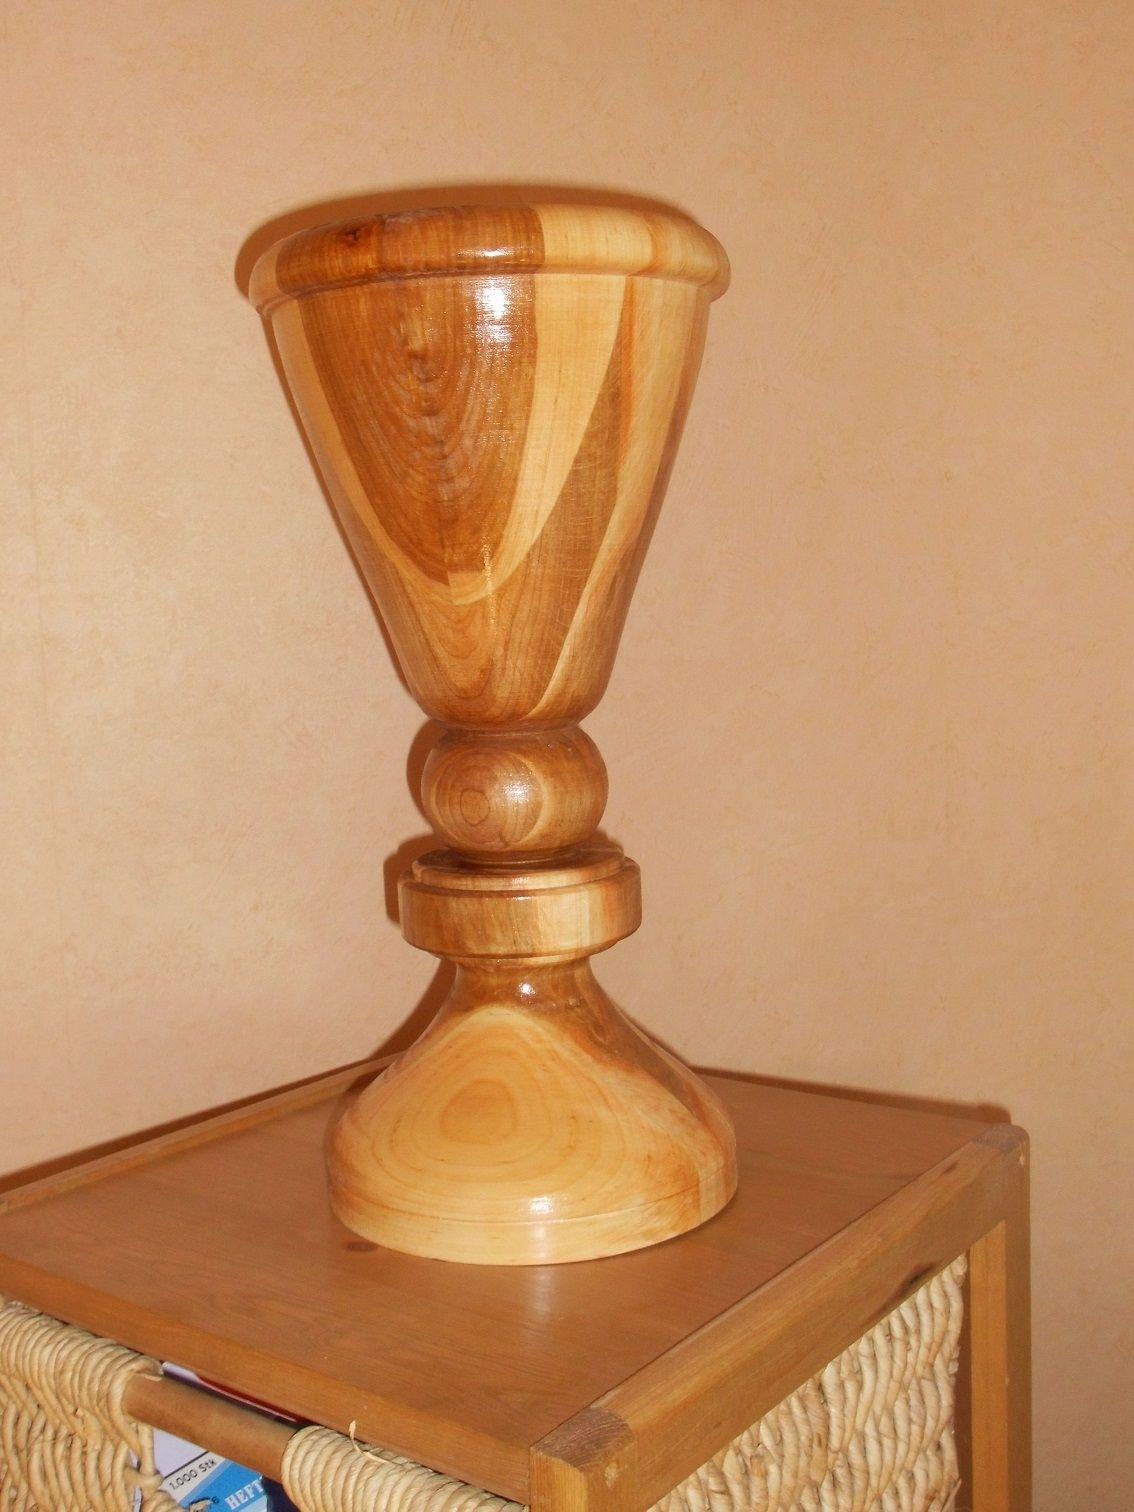 Kelch Pokal Aus Palettenholz Bastelanleitung Zum Selber